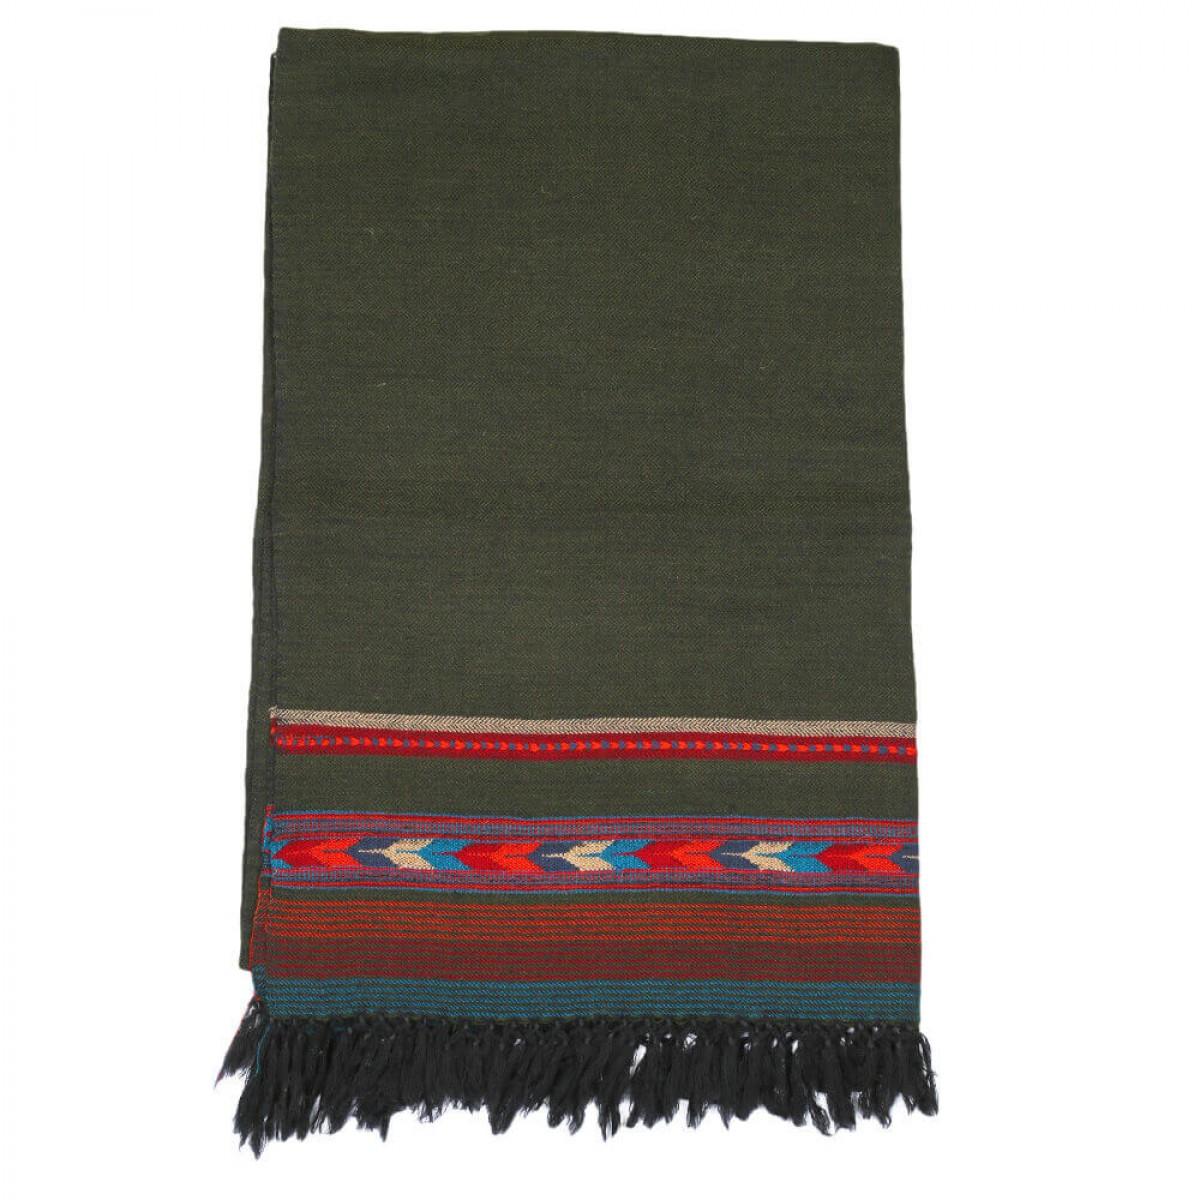 Himalayan Vibes Woolen Scarf- Dark Green